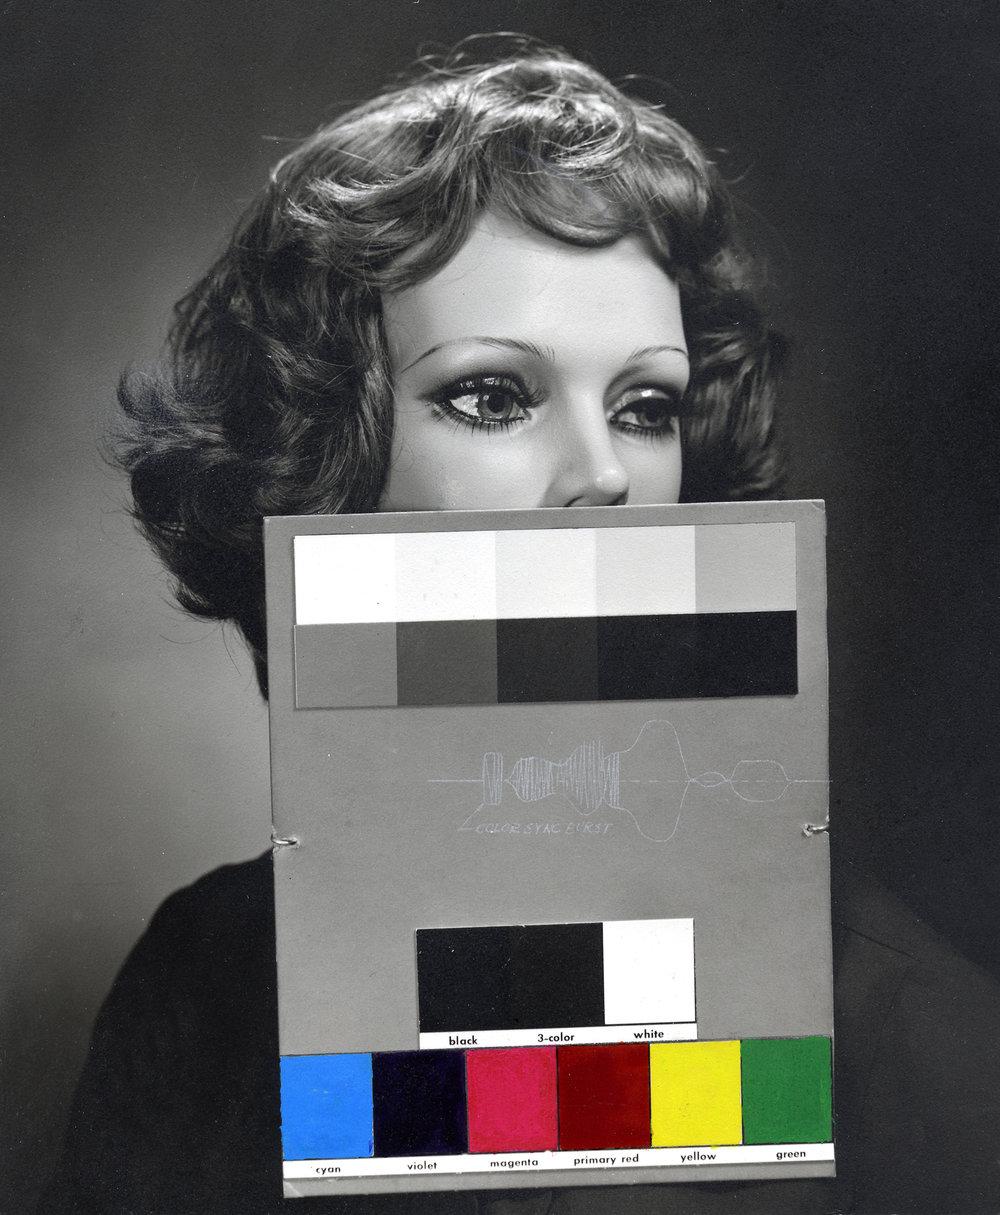 color syncsmall.jpg